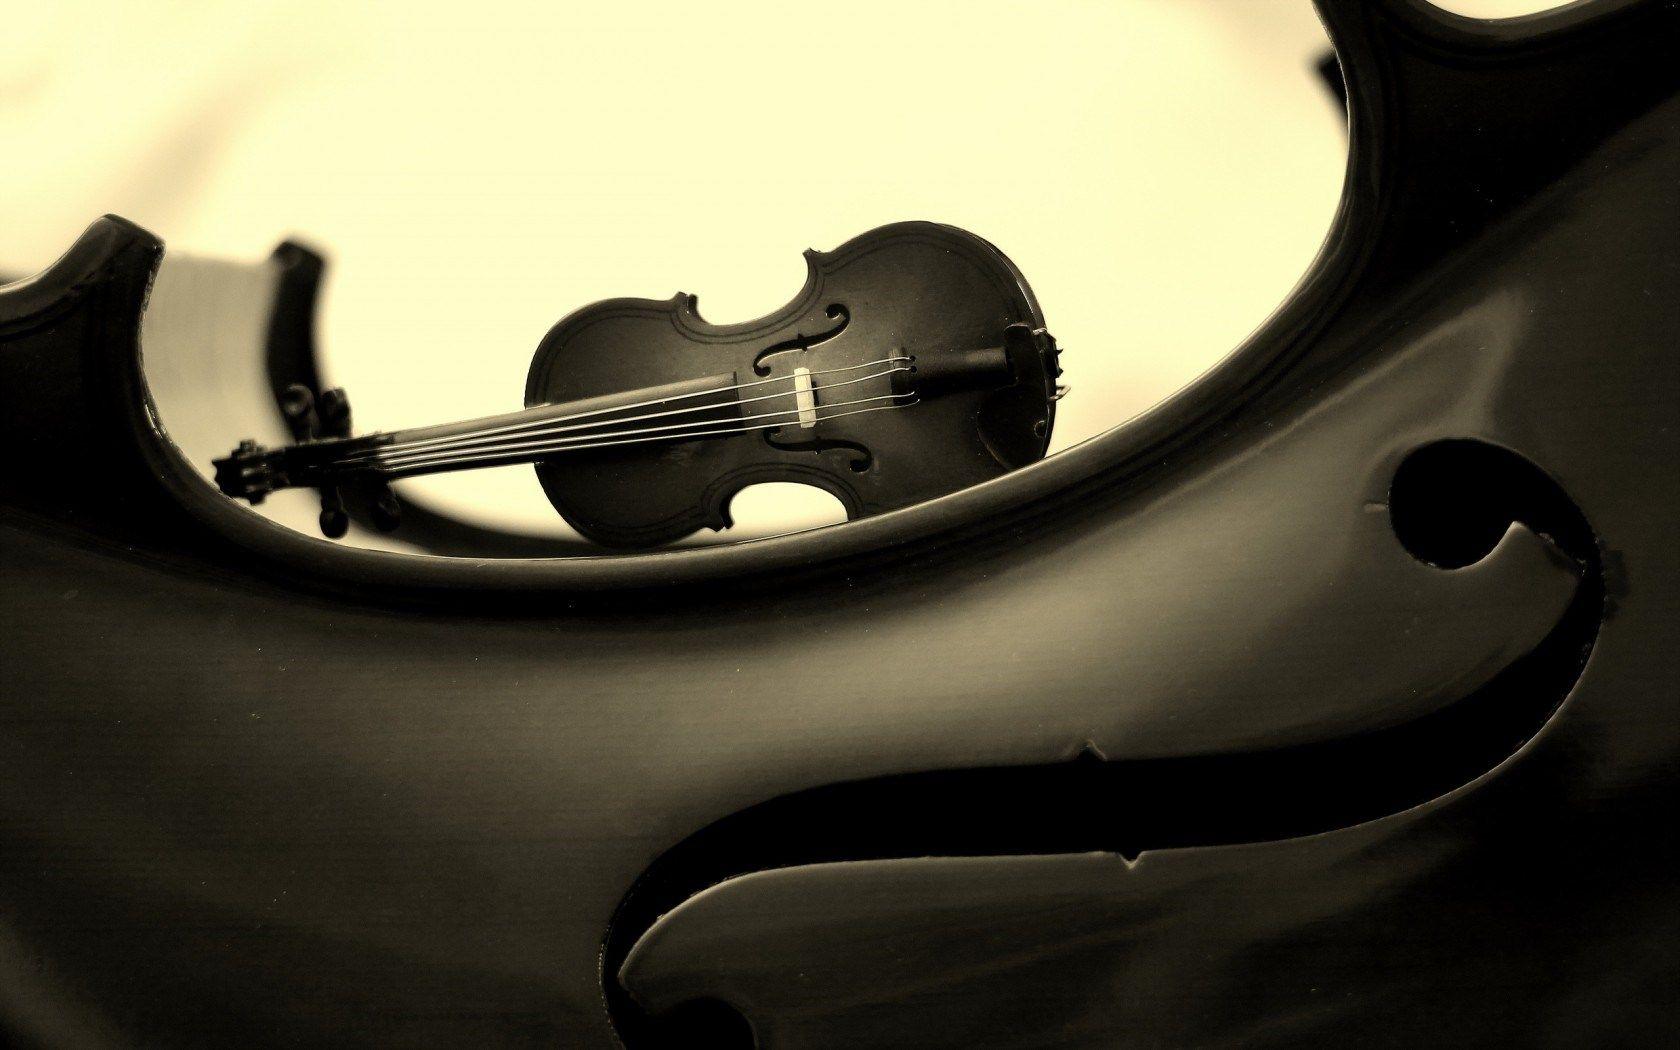 Violin Art Music Black And White Vintage Background Wallpaper Violin Retro Music Music Wallpaper